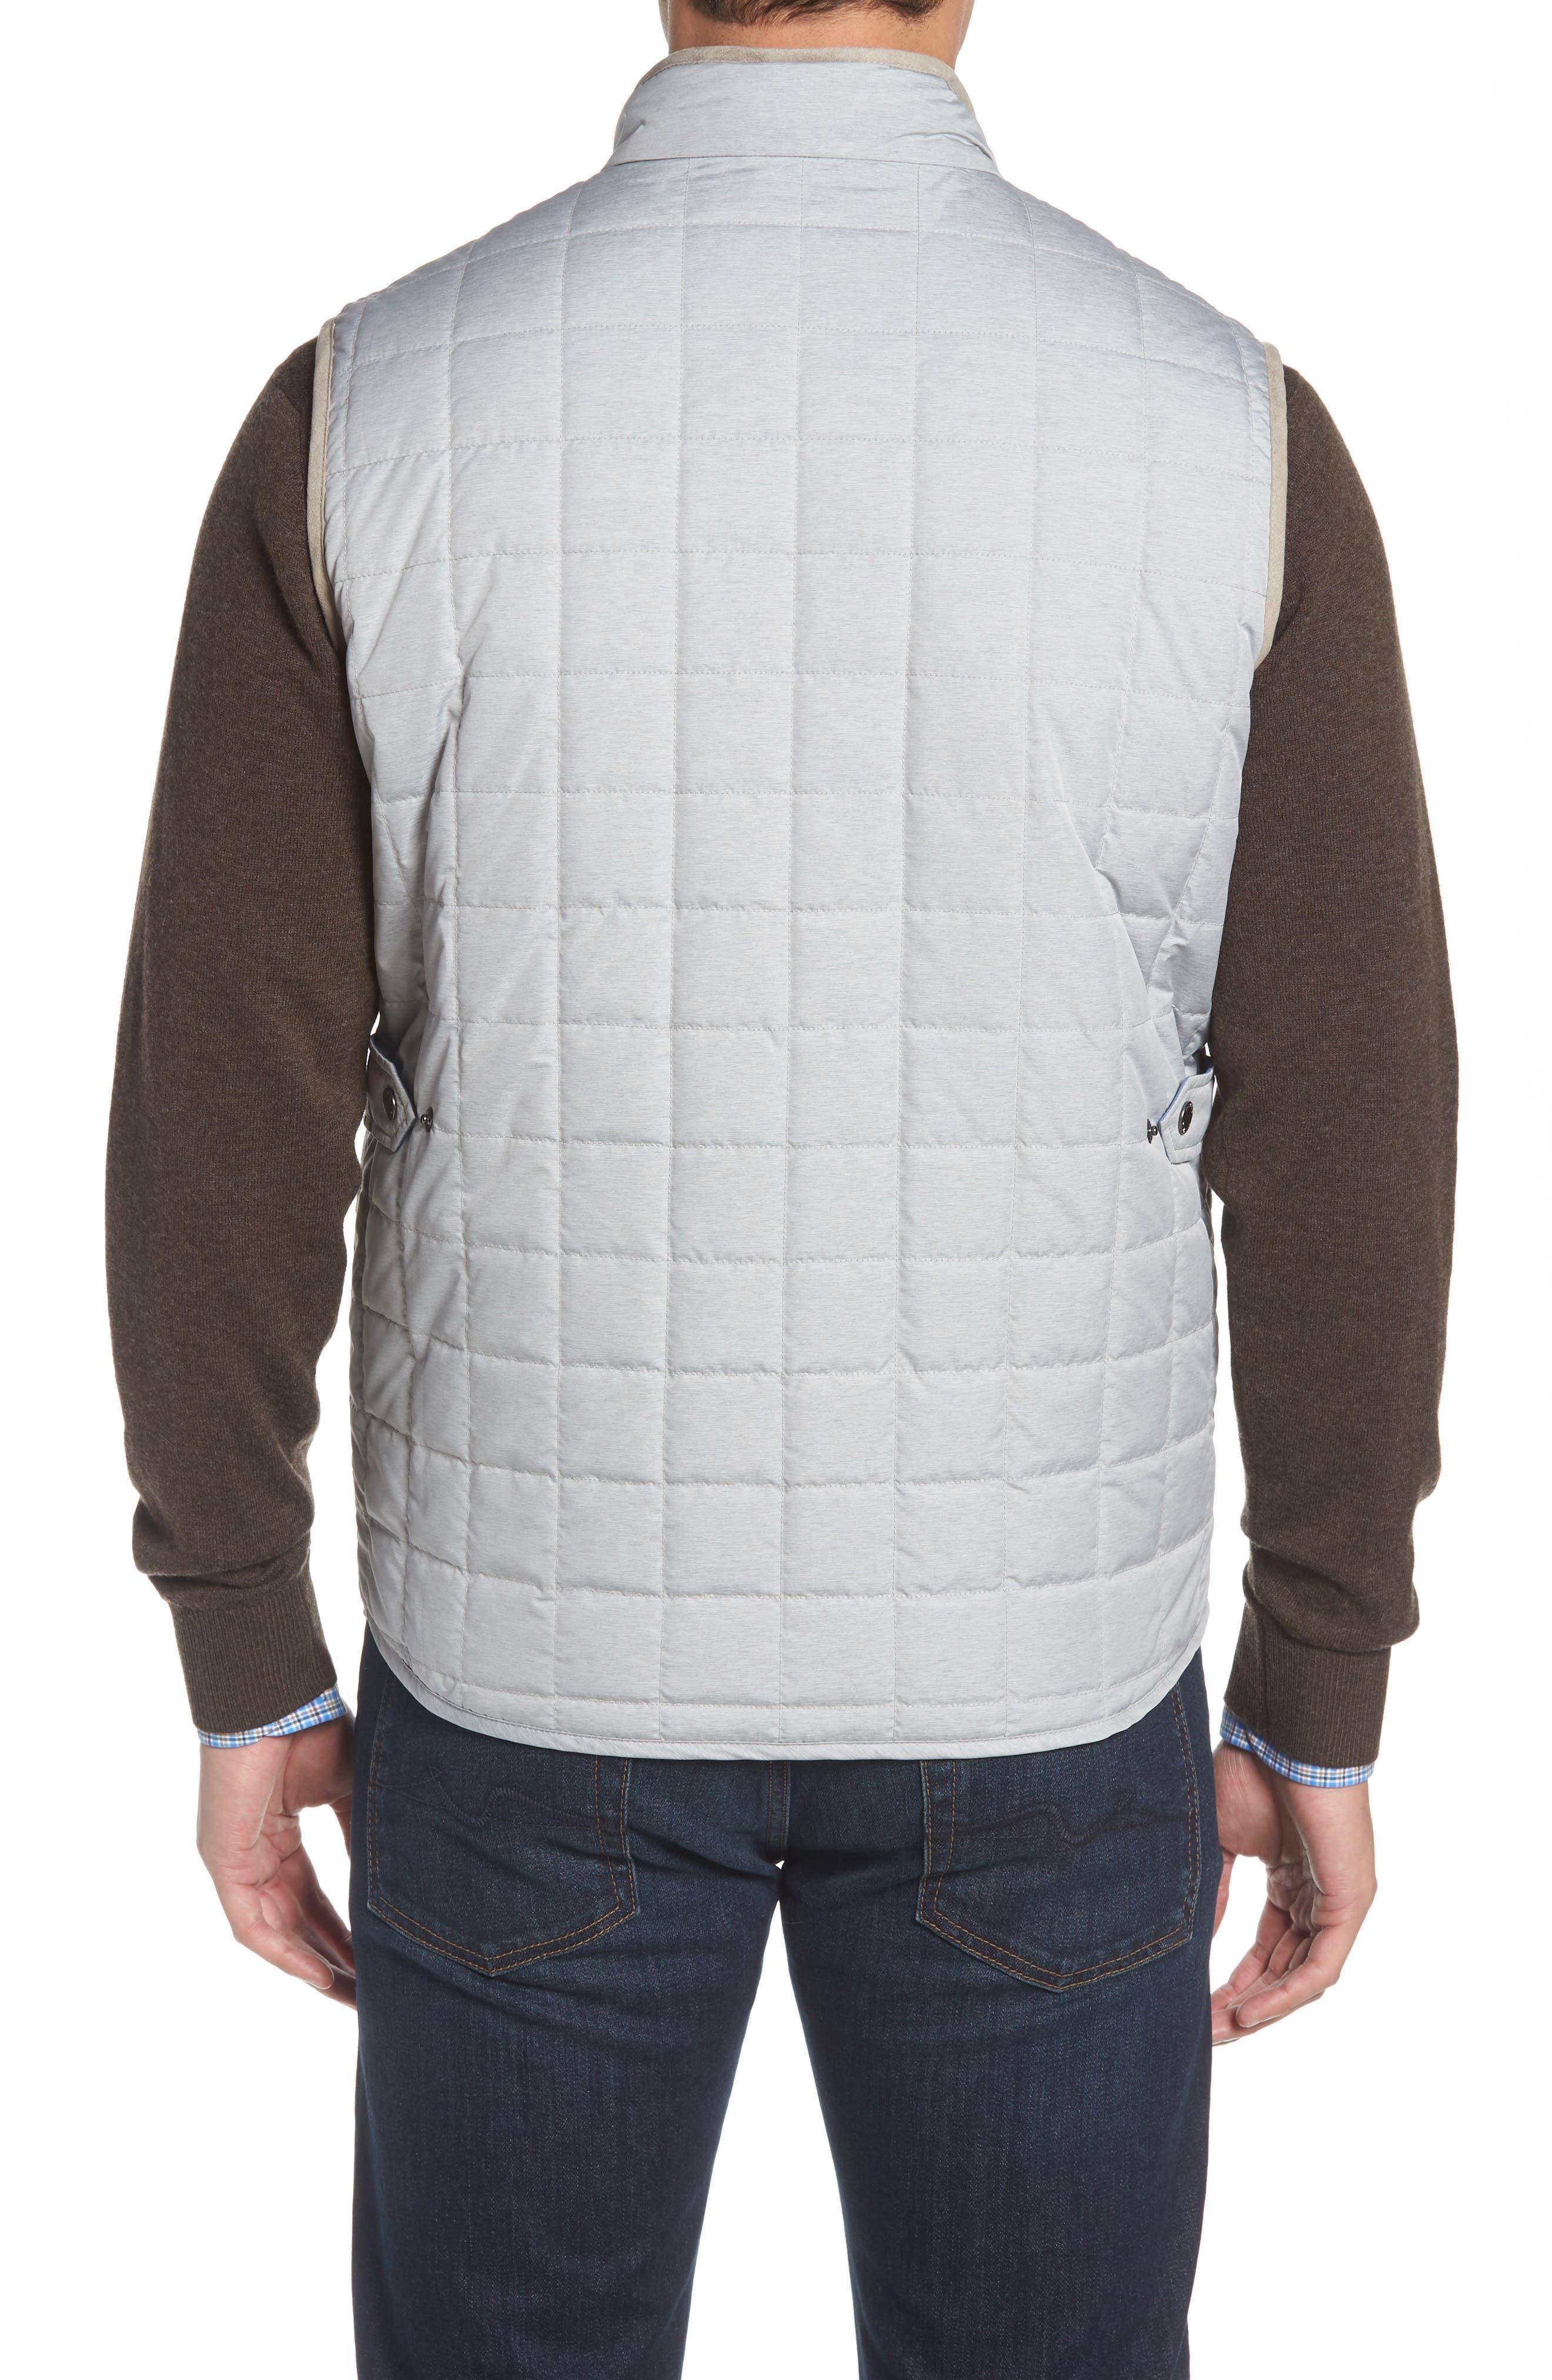 Seneca Quilted Vest,                             Alternate thumbnail 2, color,                             BRITISH GREY